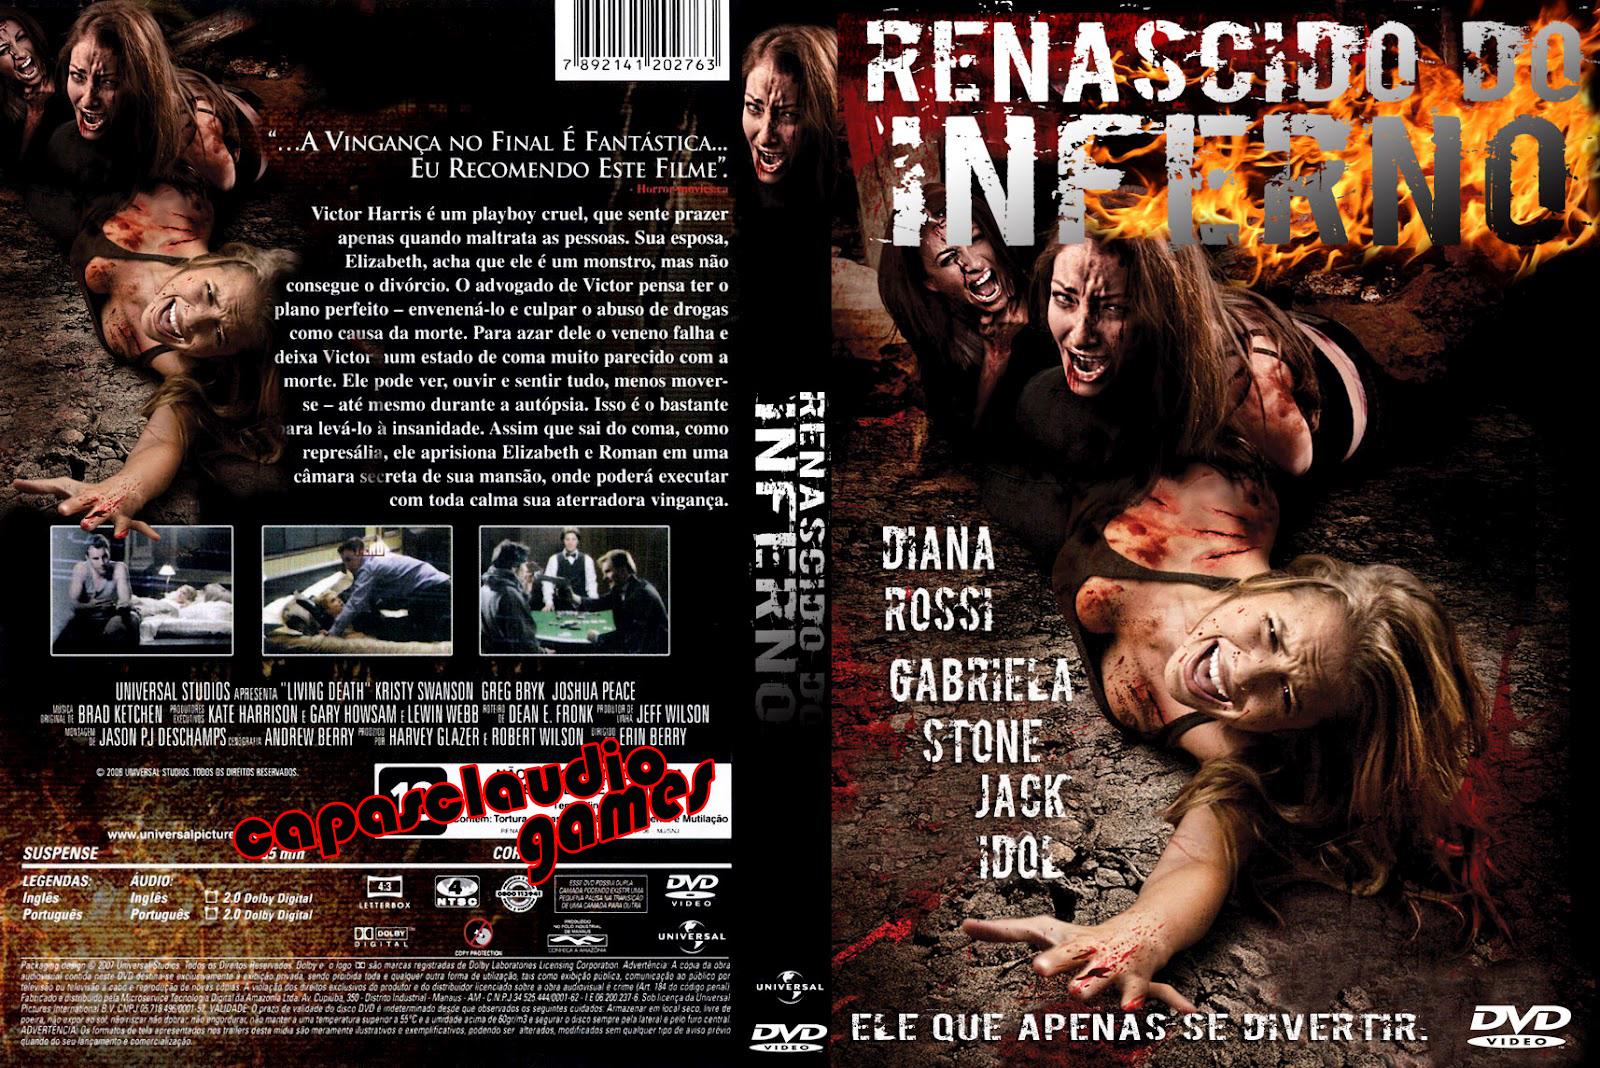 Renascida do Inferno Blu-ray Rip 720p 1080p Torrent